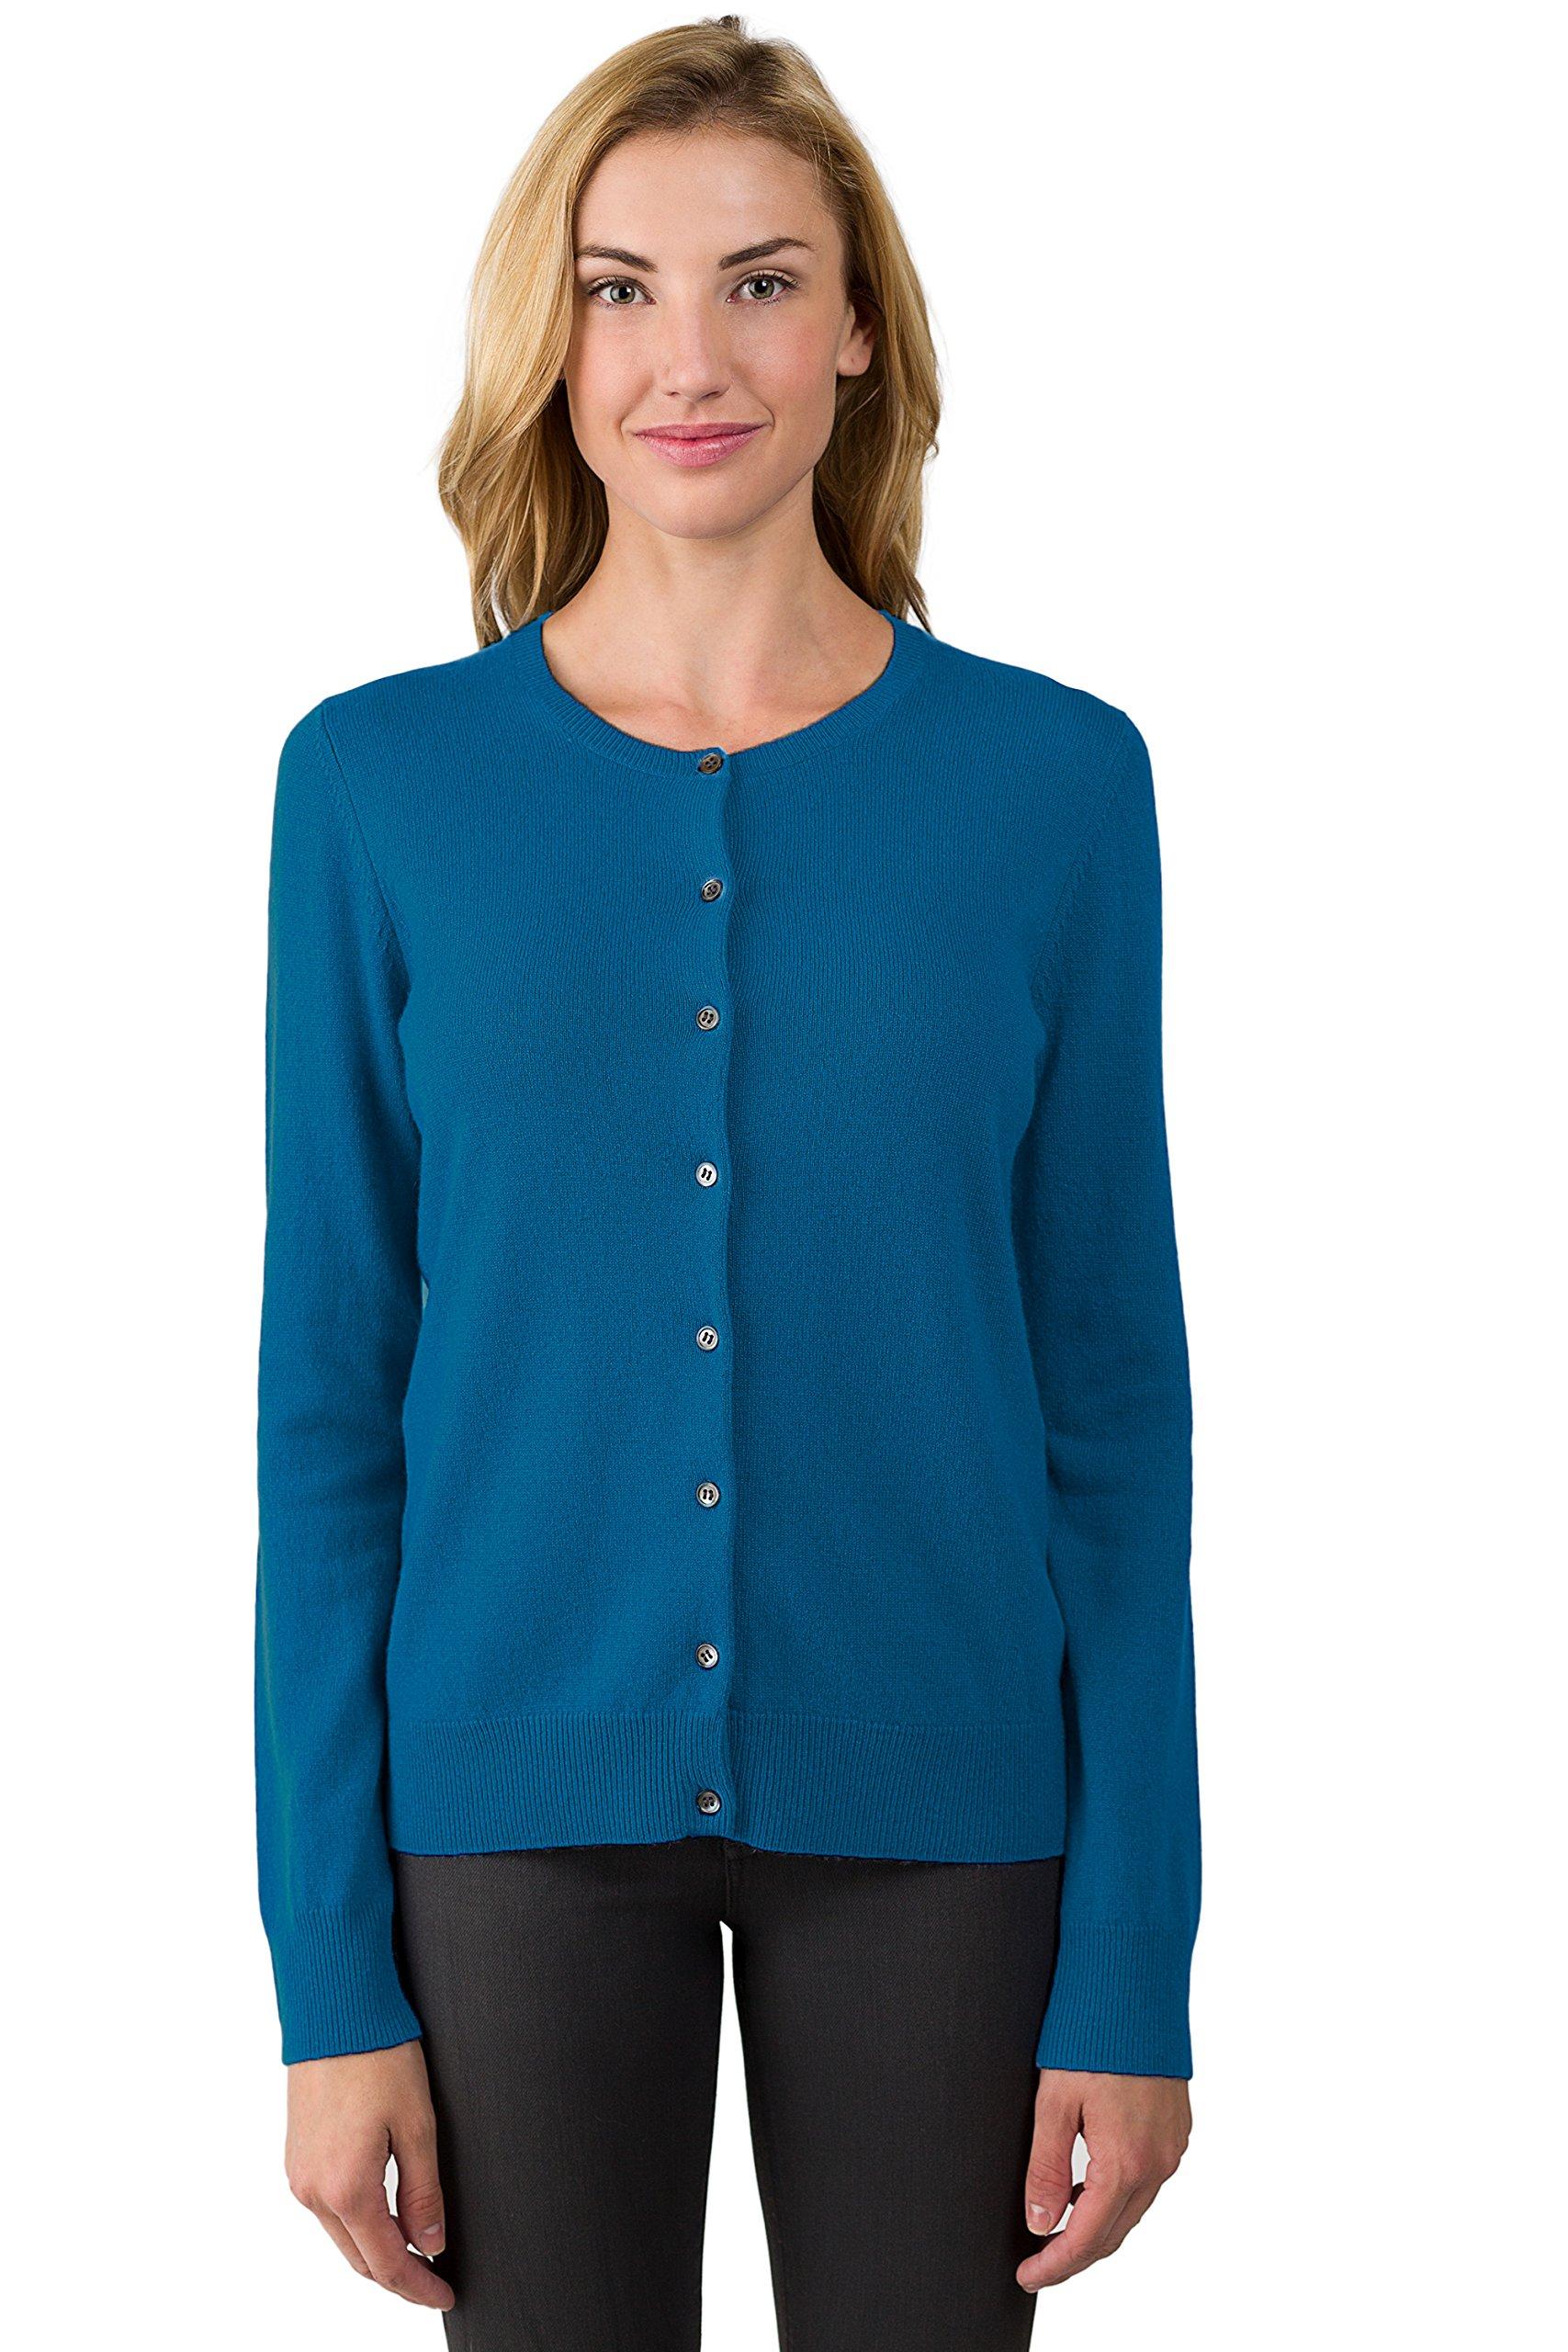 JENNIE LIU Women's 100% Cashmere Button Front Long Sleeve Crewneck Cardigan Sweater (L, Peacock)